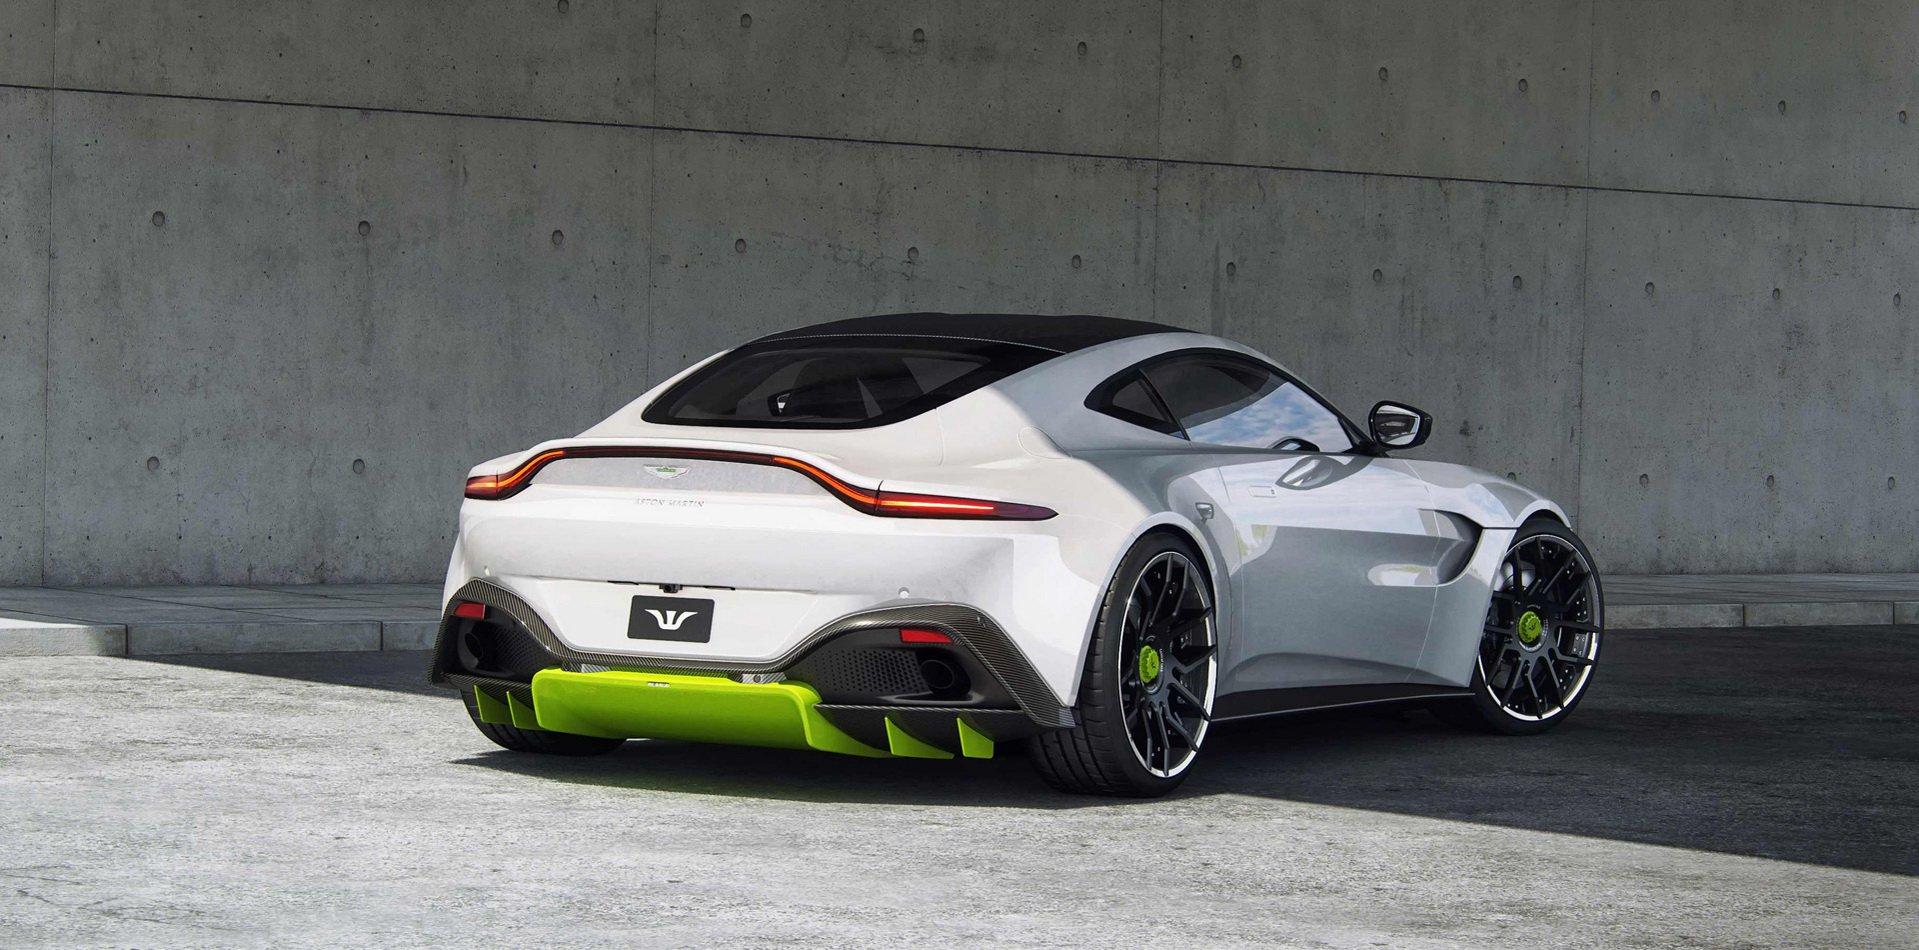 Aston Martin Vantage by wheelsandmore (2)